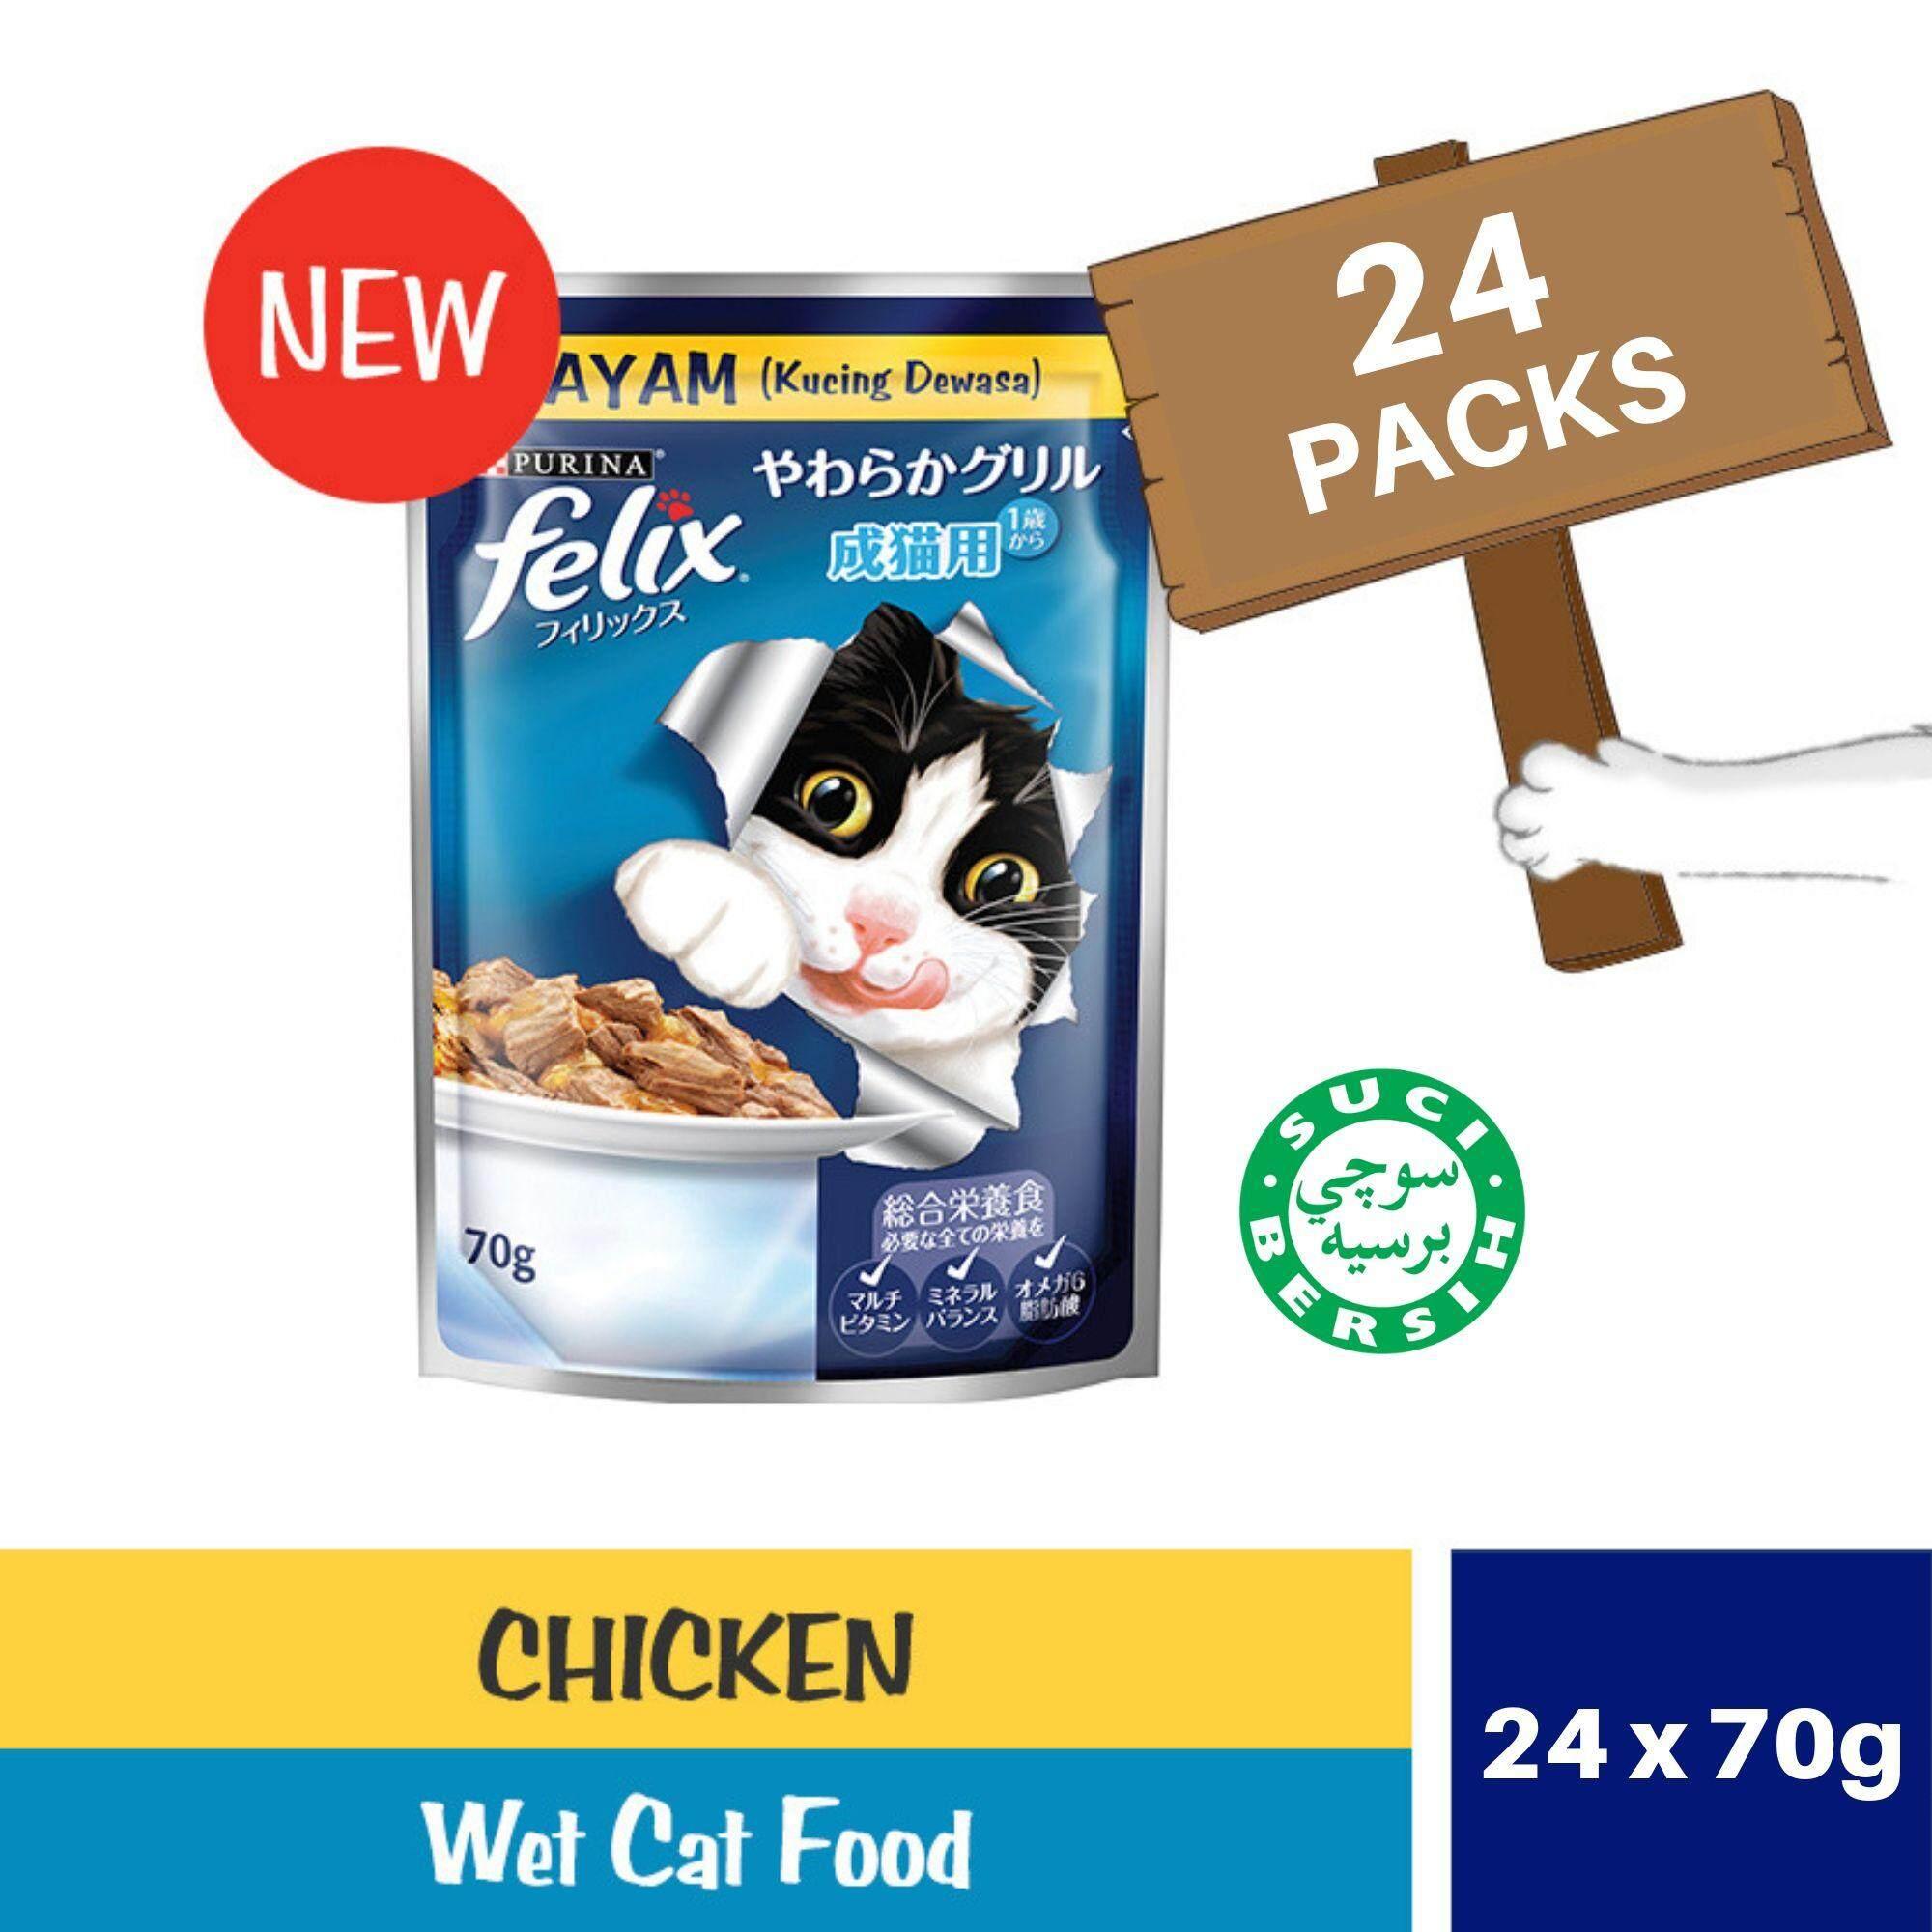 FELIX® Adult Cat Wet Food Pouch Chicken (24 x 70g) - Pet Food/ Wet Food/ Cat Food/  Makanan Kucing